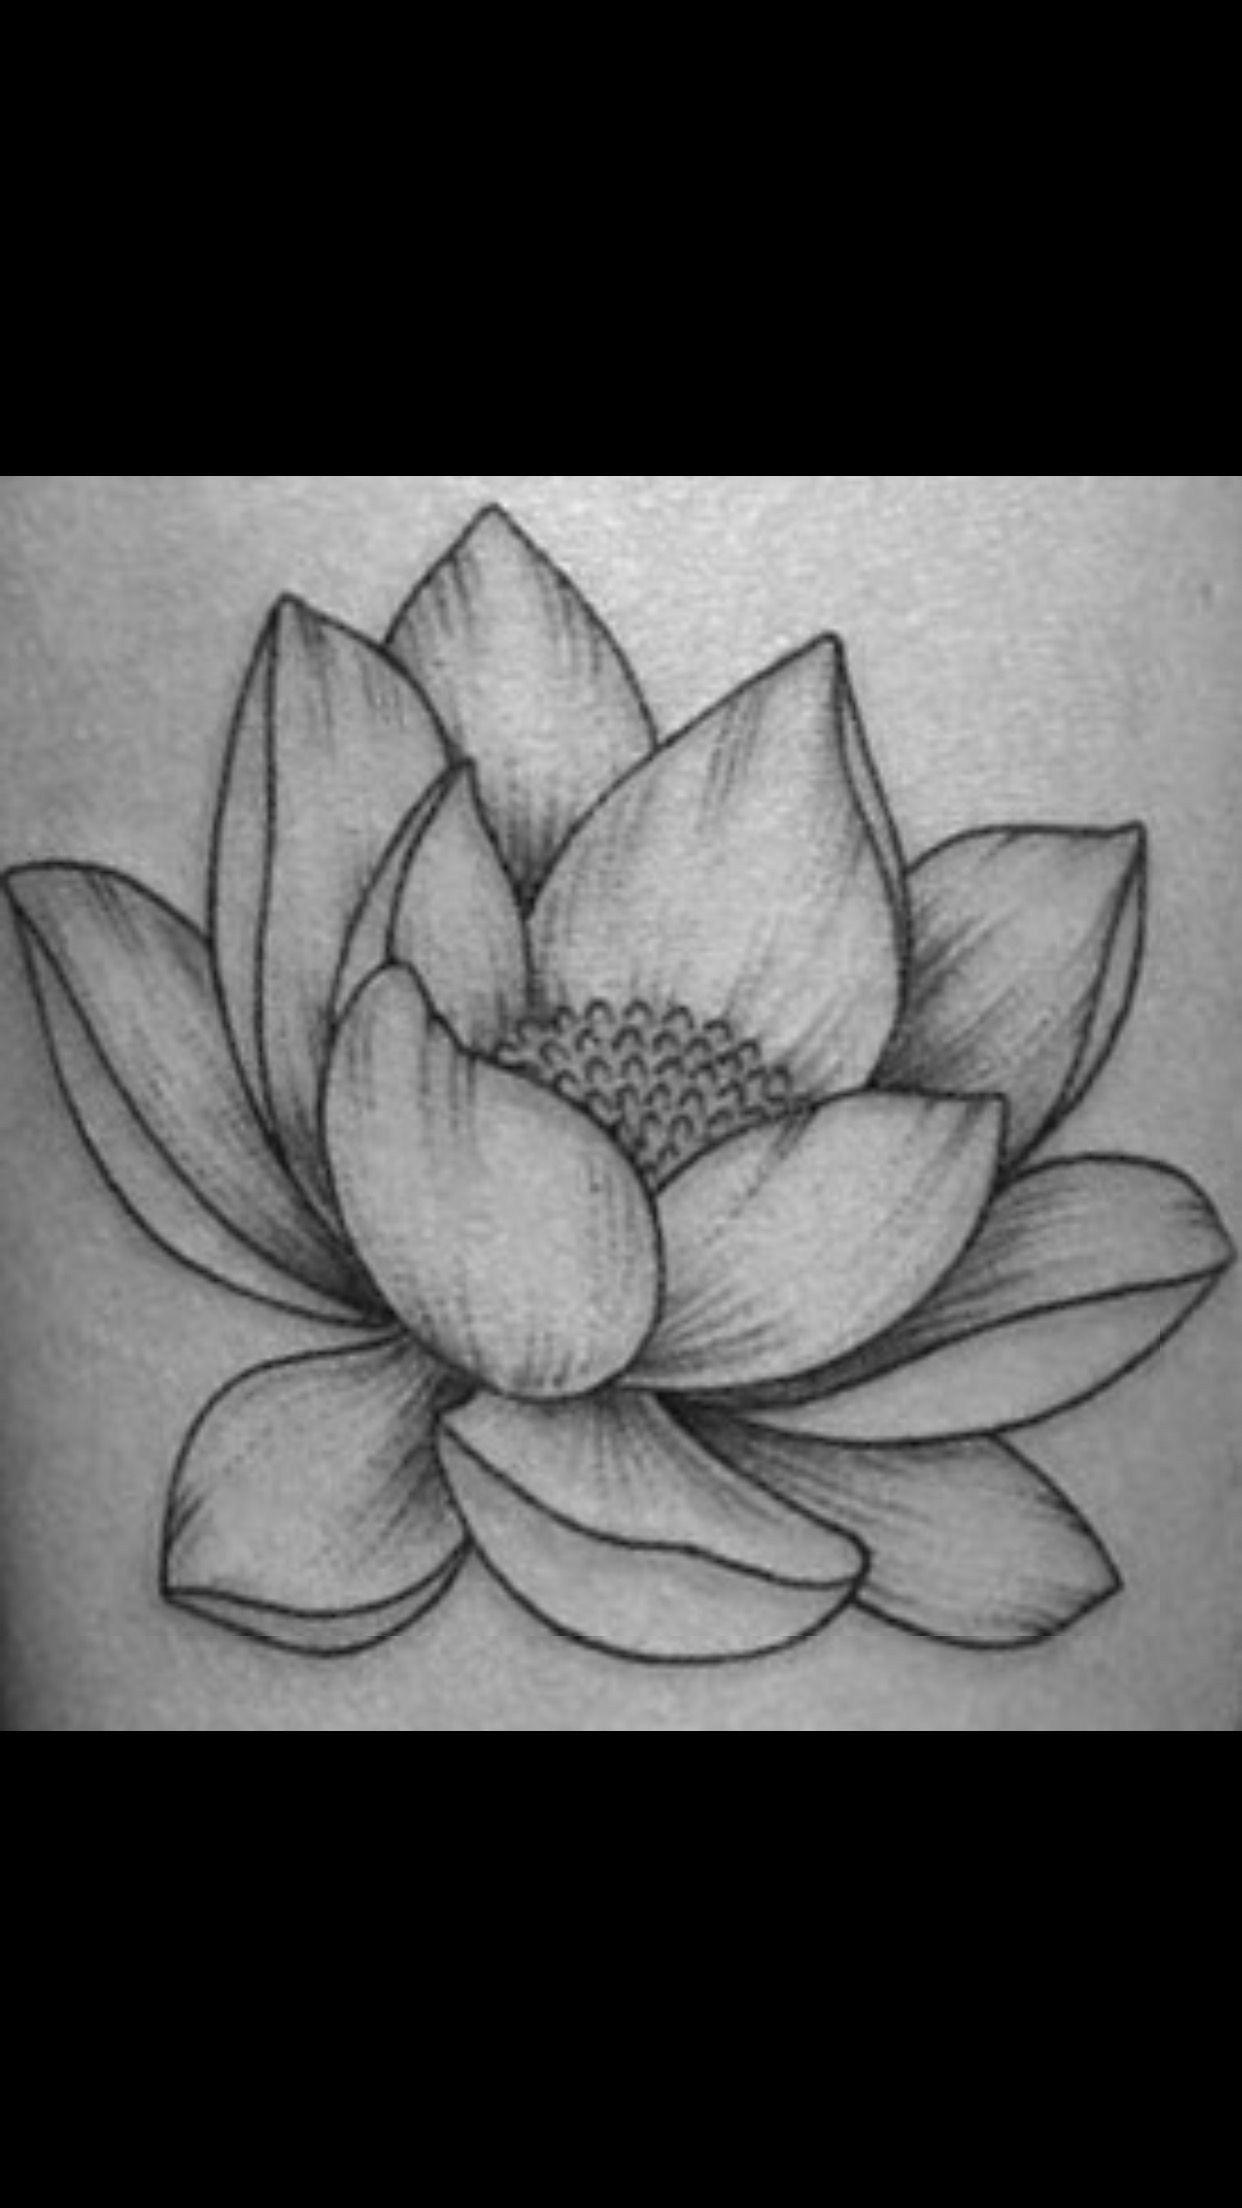 Lotus Flower Drawing For Kids Pw Navi in Realistic Flower Drawing #lotusflower